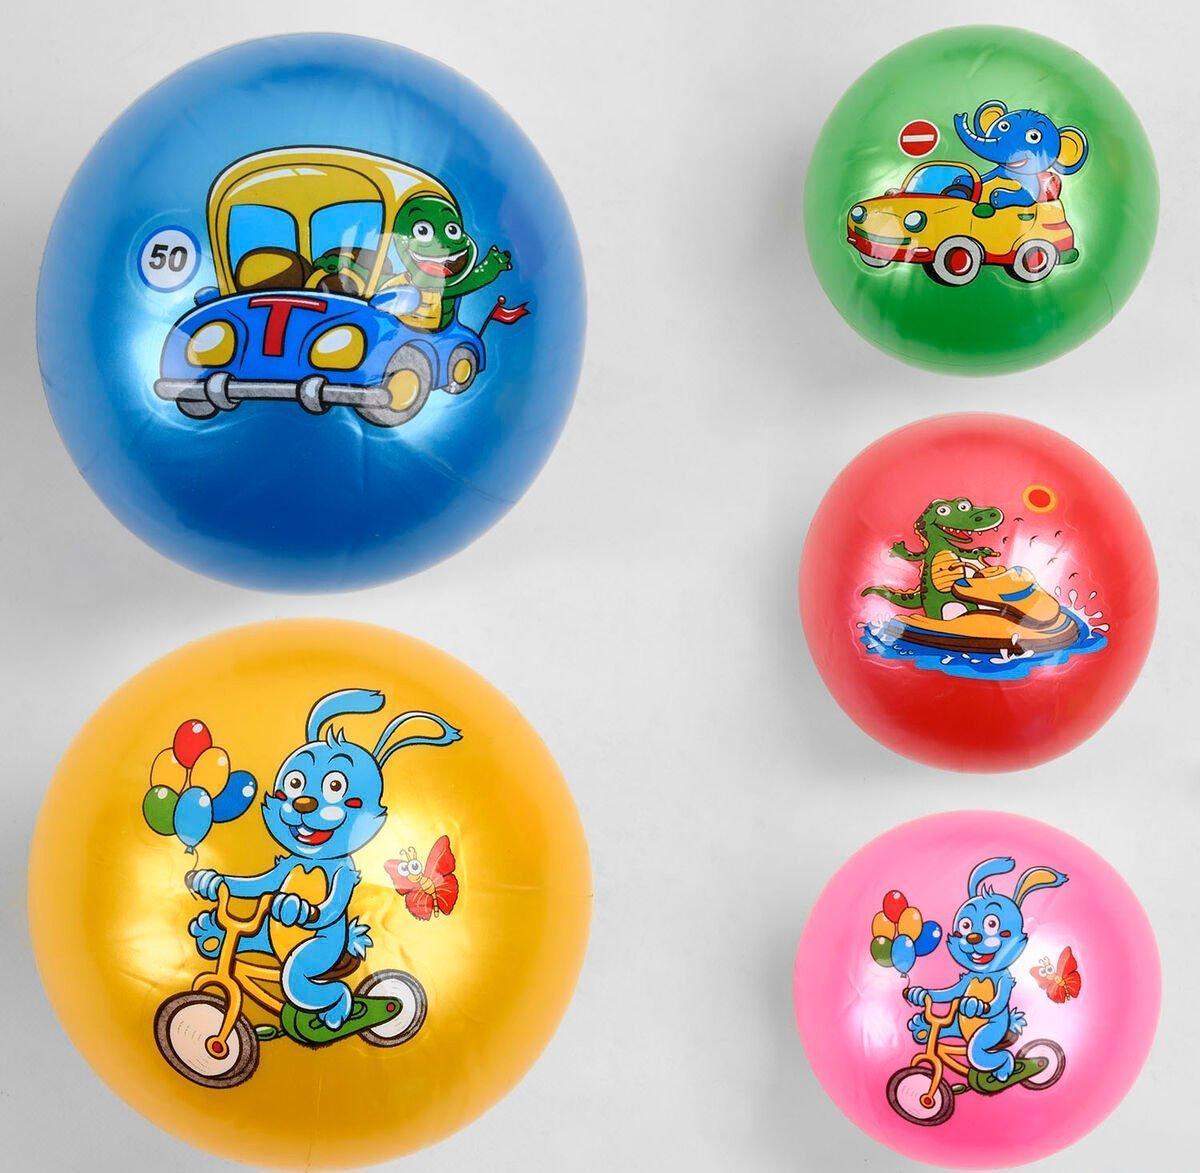 "Мяч резиновый ""Зверята на транспорте"" 5 видов, размер 9"", вес 60 грамм C 44680"